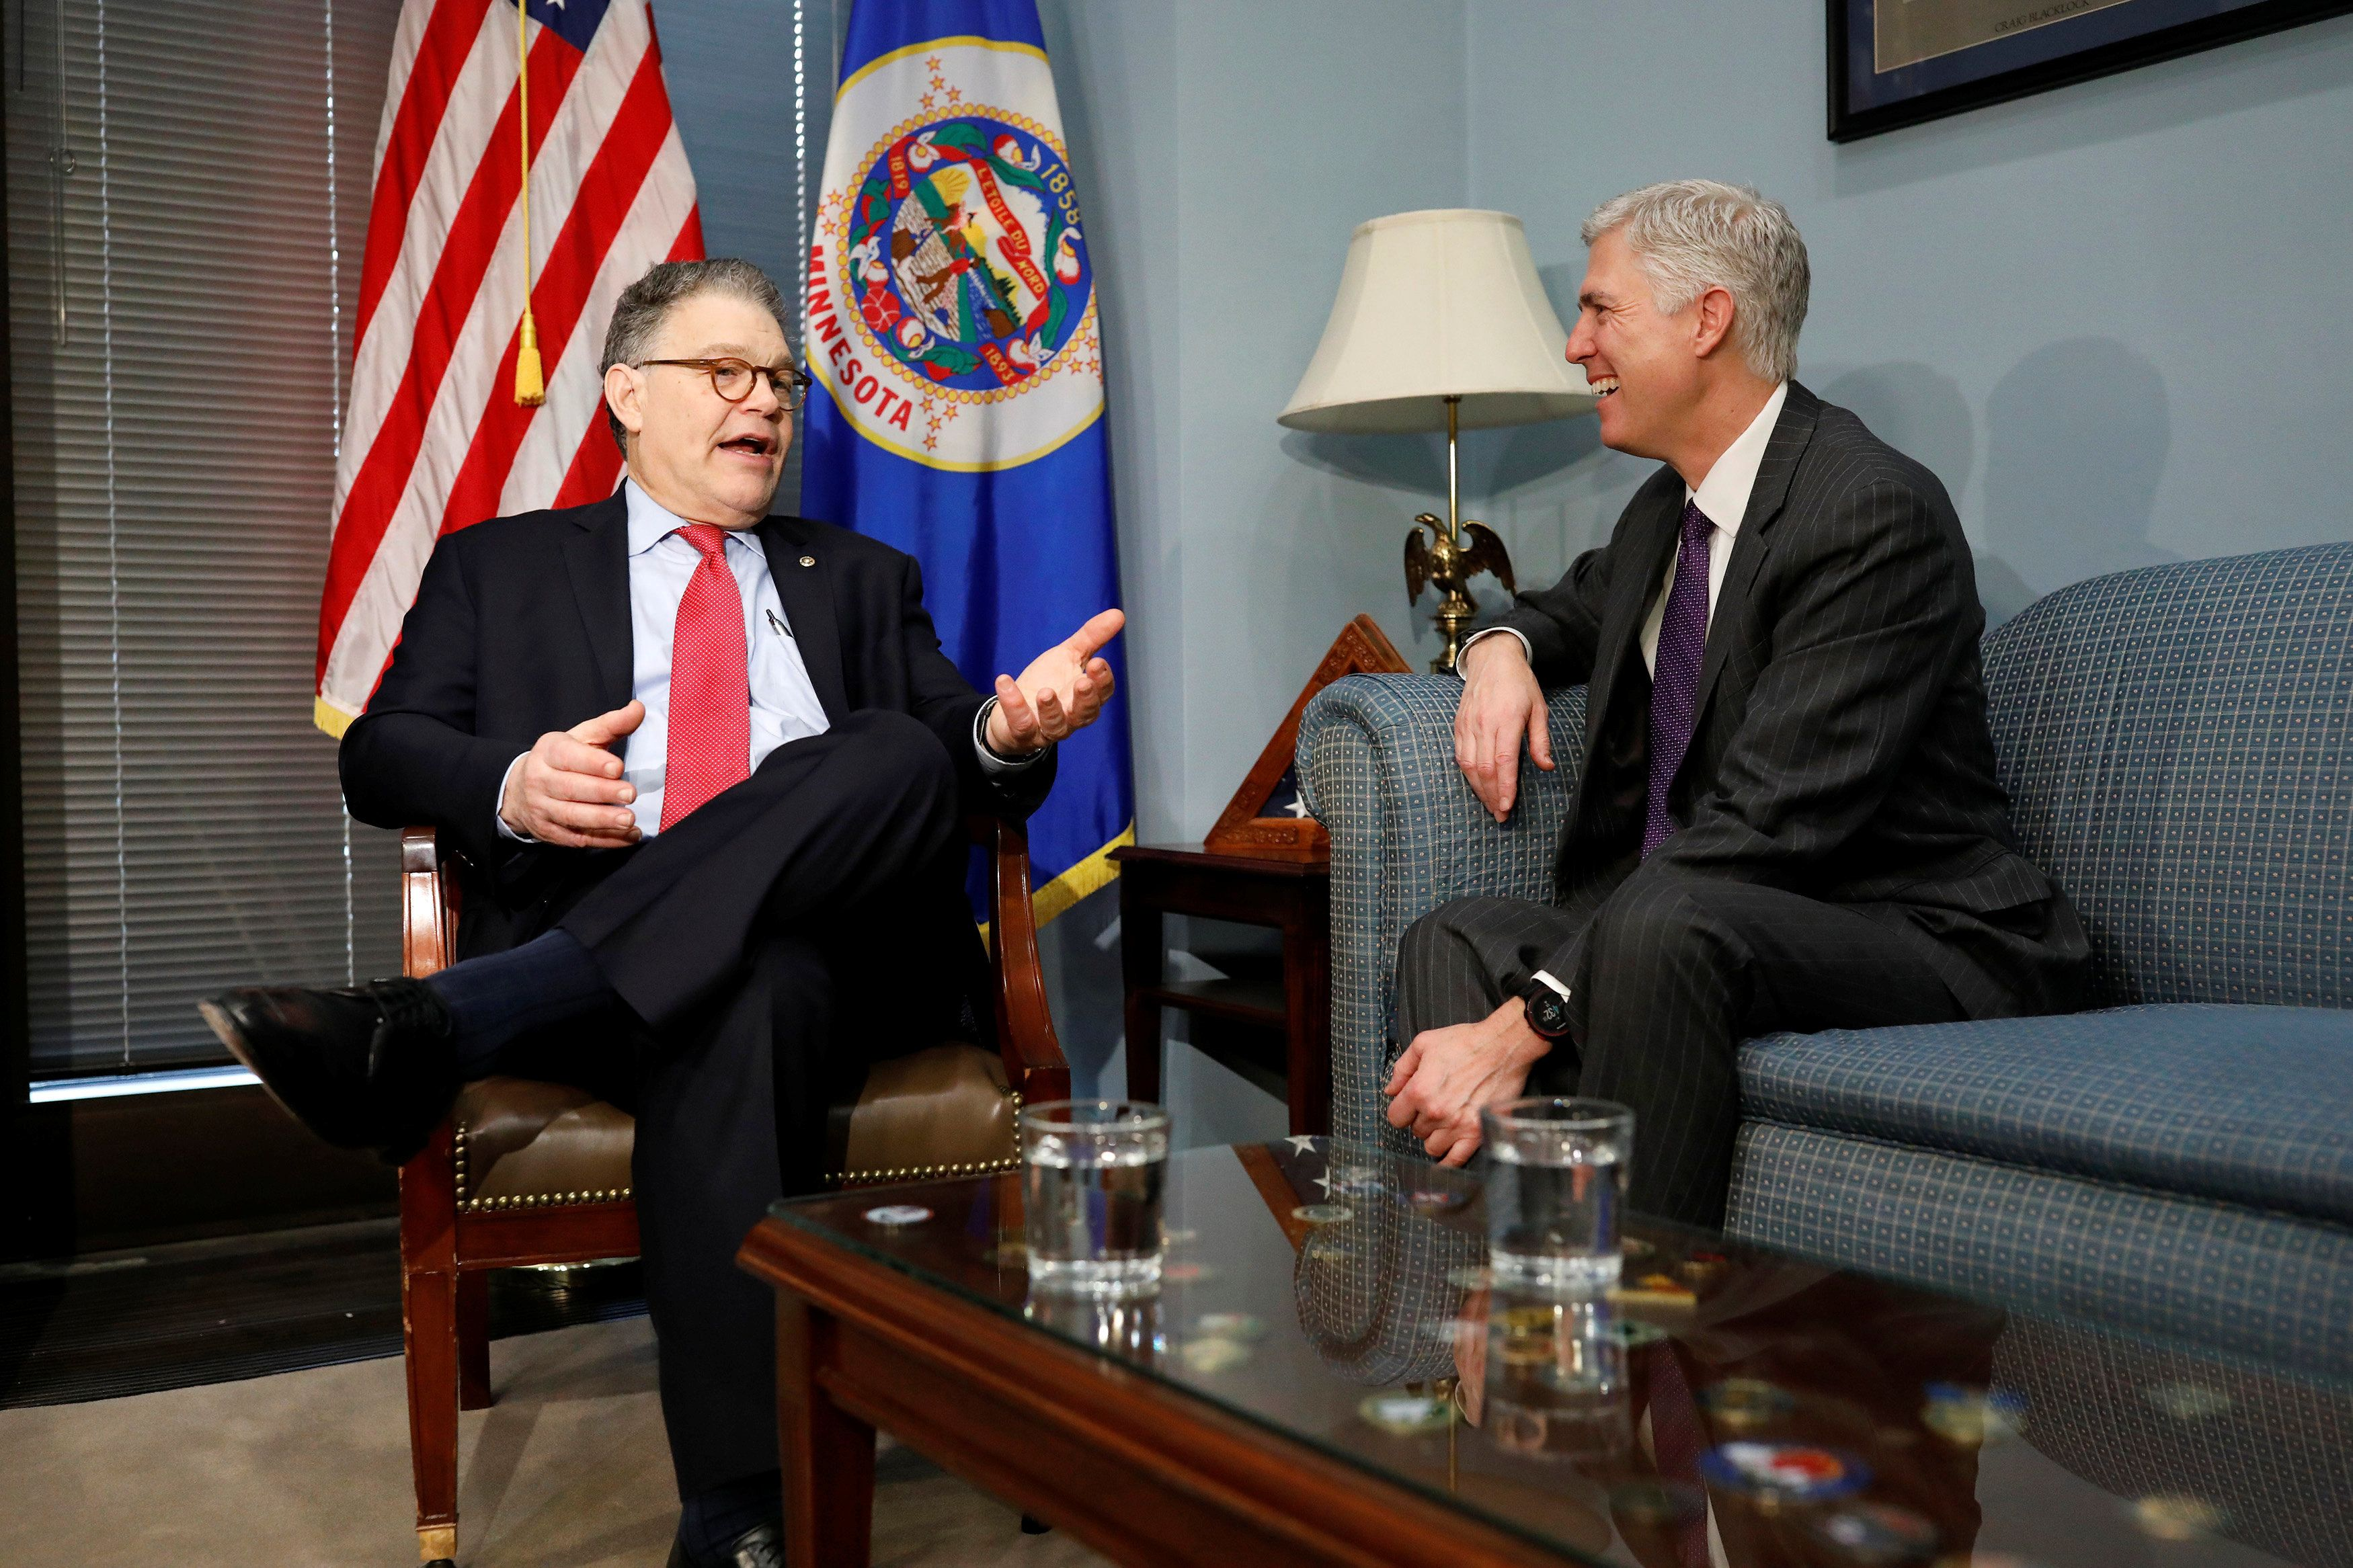 Senator Al Franken (D-MN) speaks with President Donald Trump's Supreme Court nominee Neil Gorsuch at his office on Capitol Hi